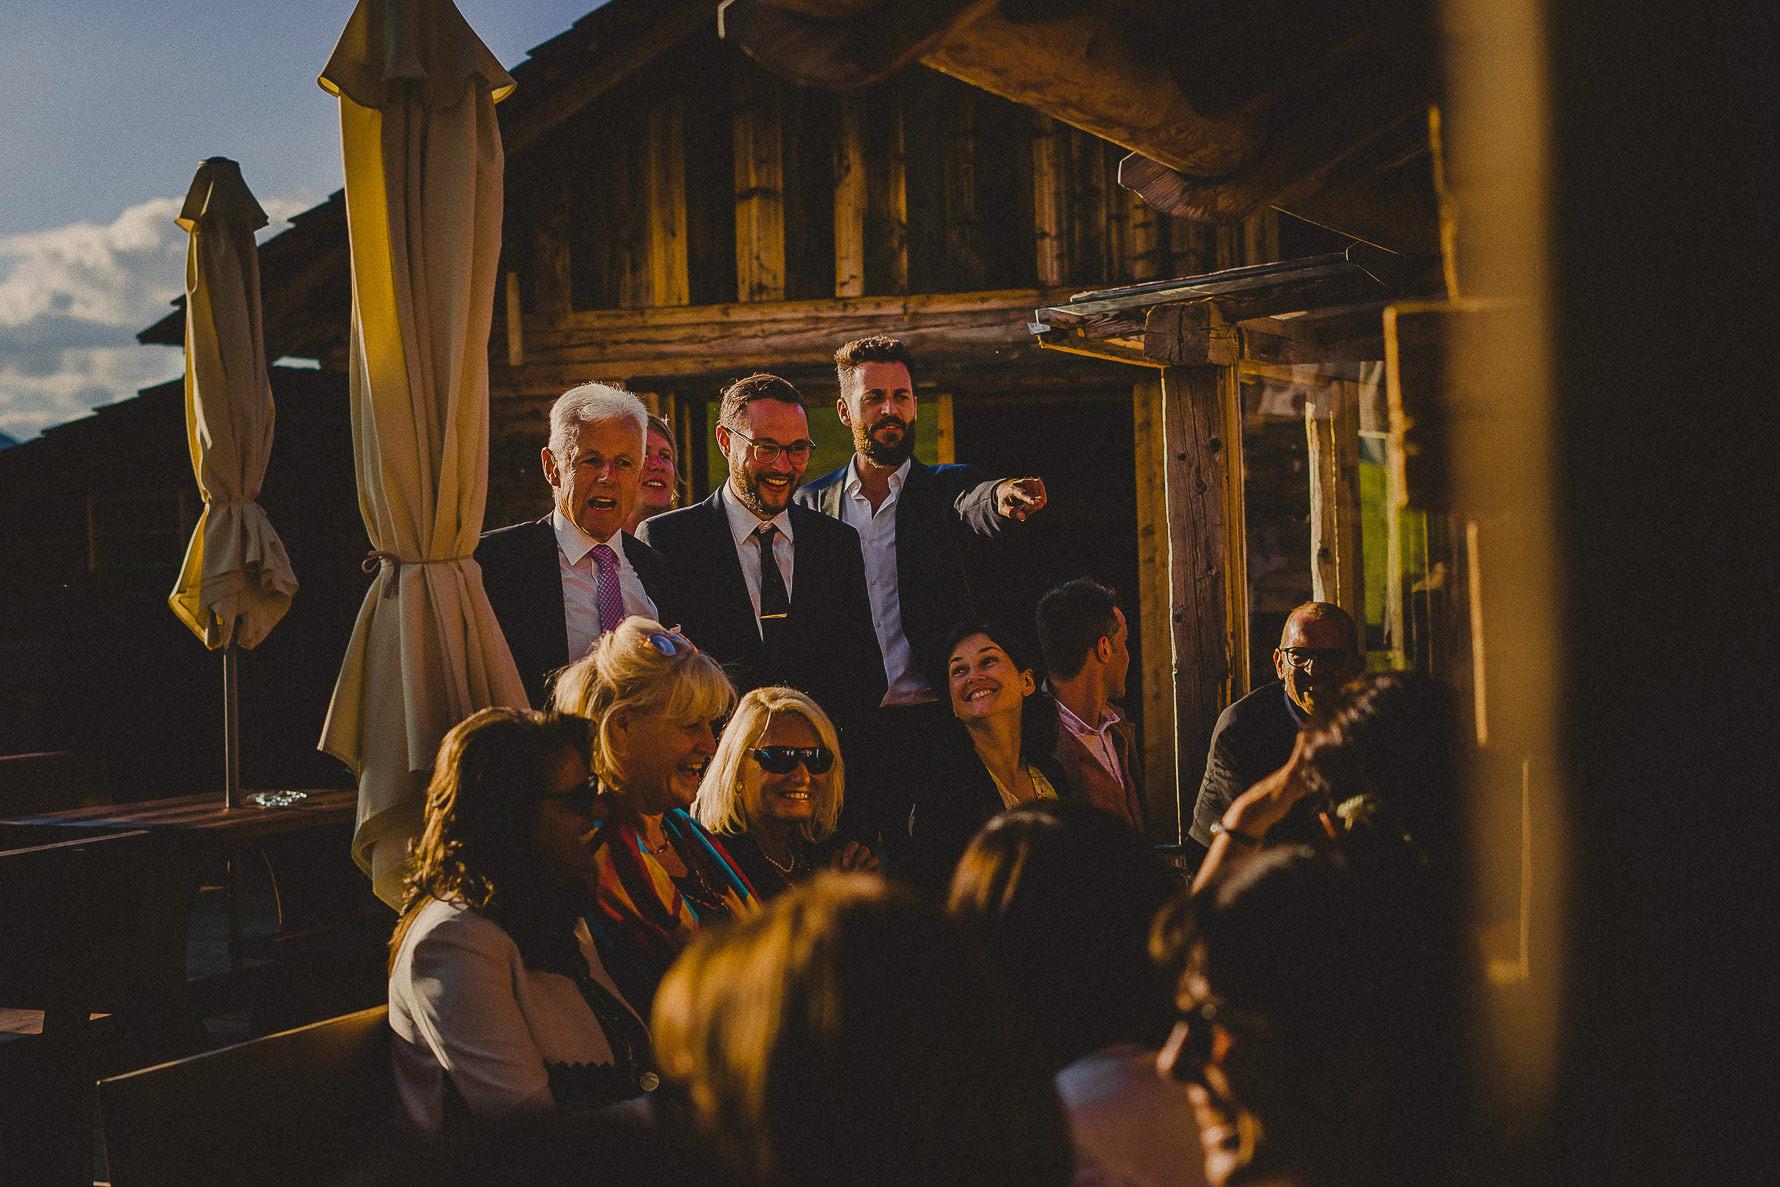 dolomites-wedding-photographer-livio-lacurre-mont-de-fornella